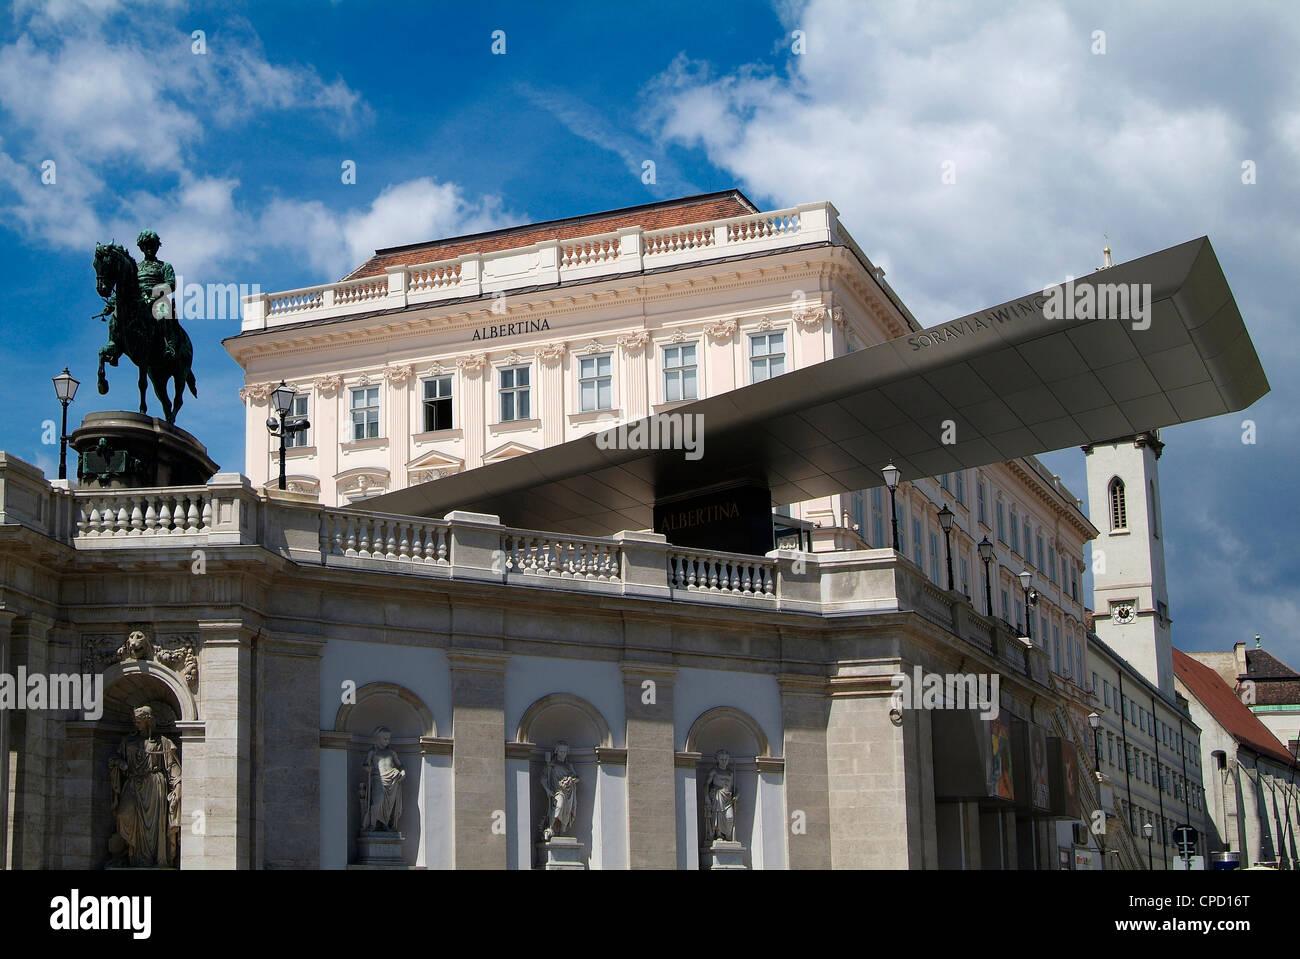 Albertina, Vienne, Autriche, Europe Photo Stock